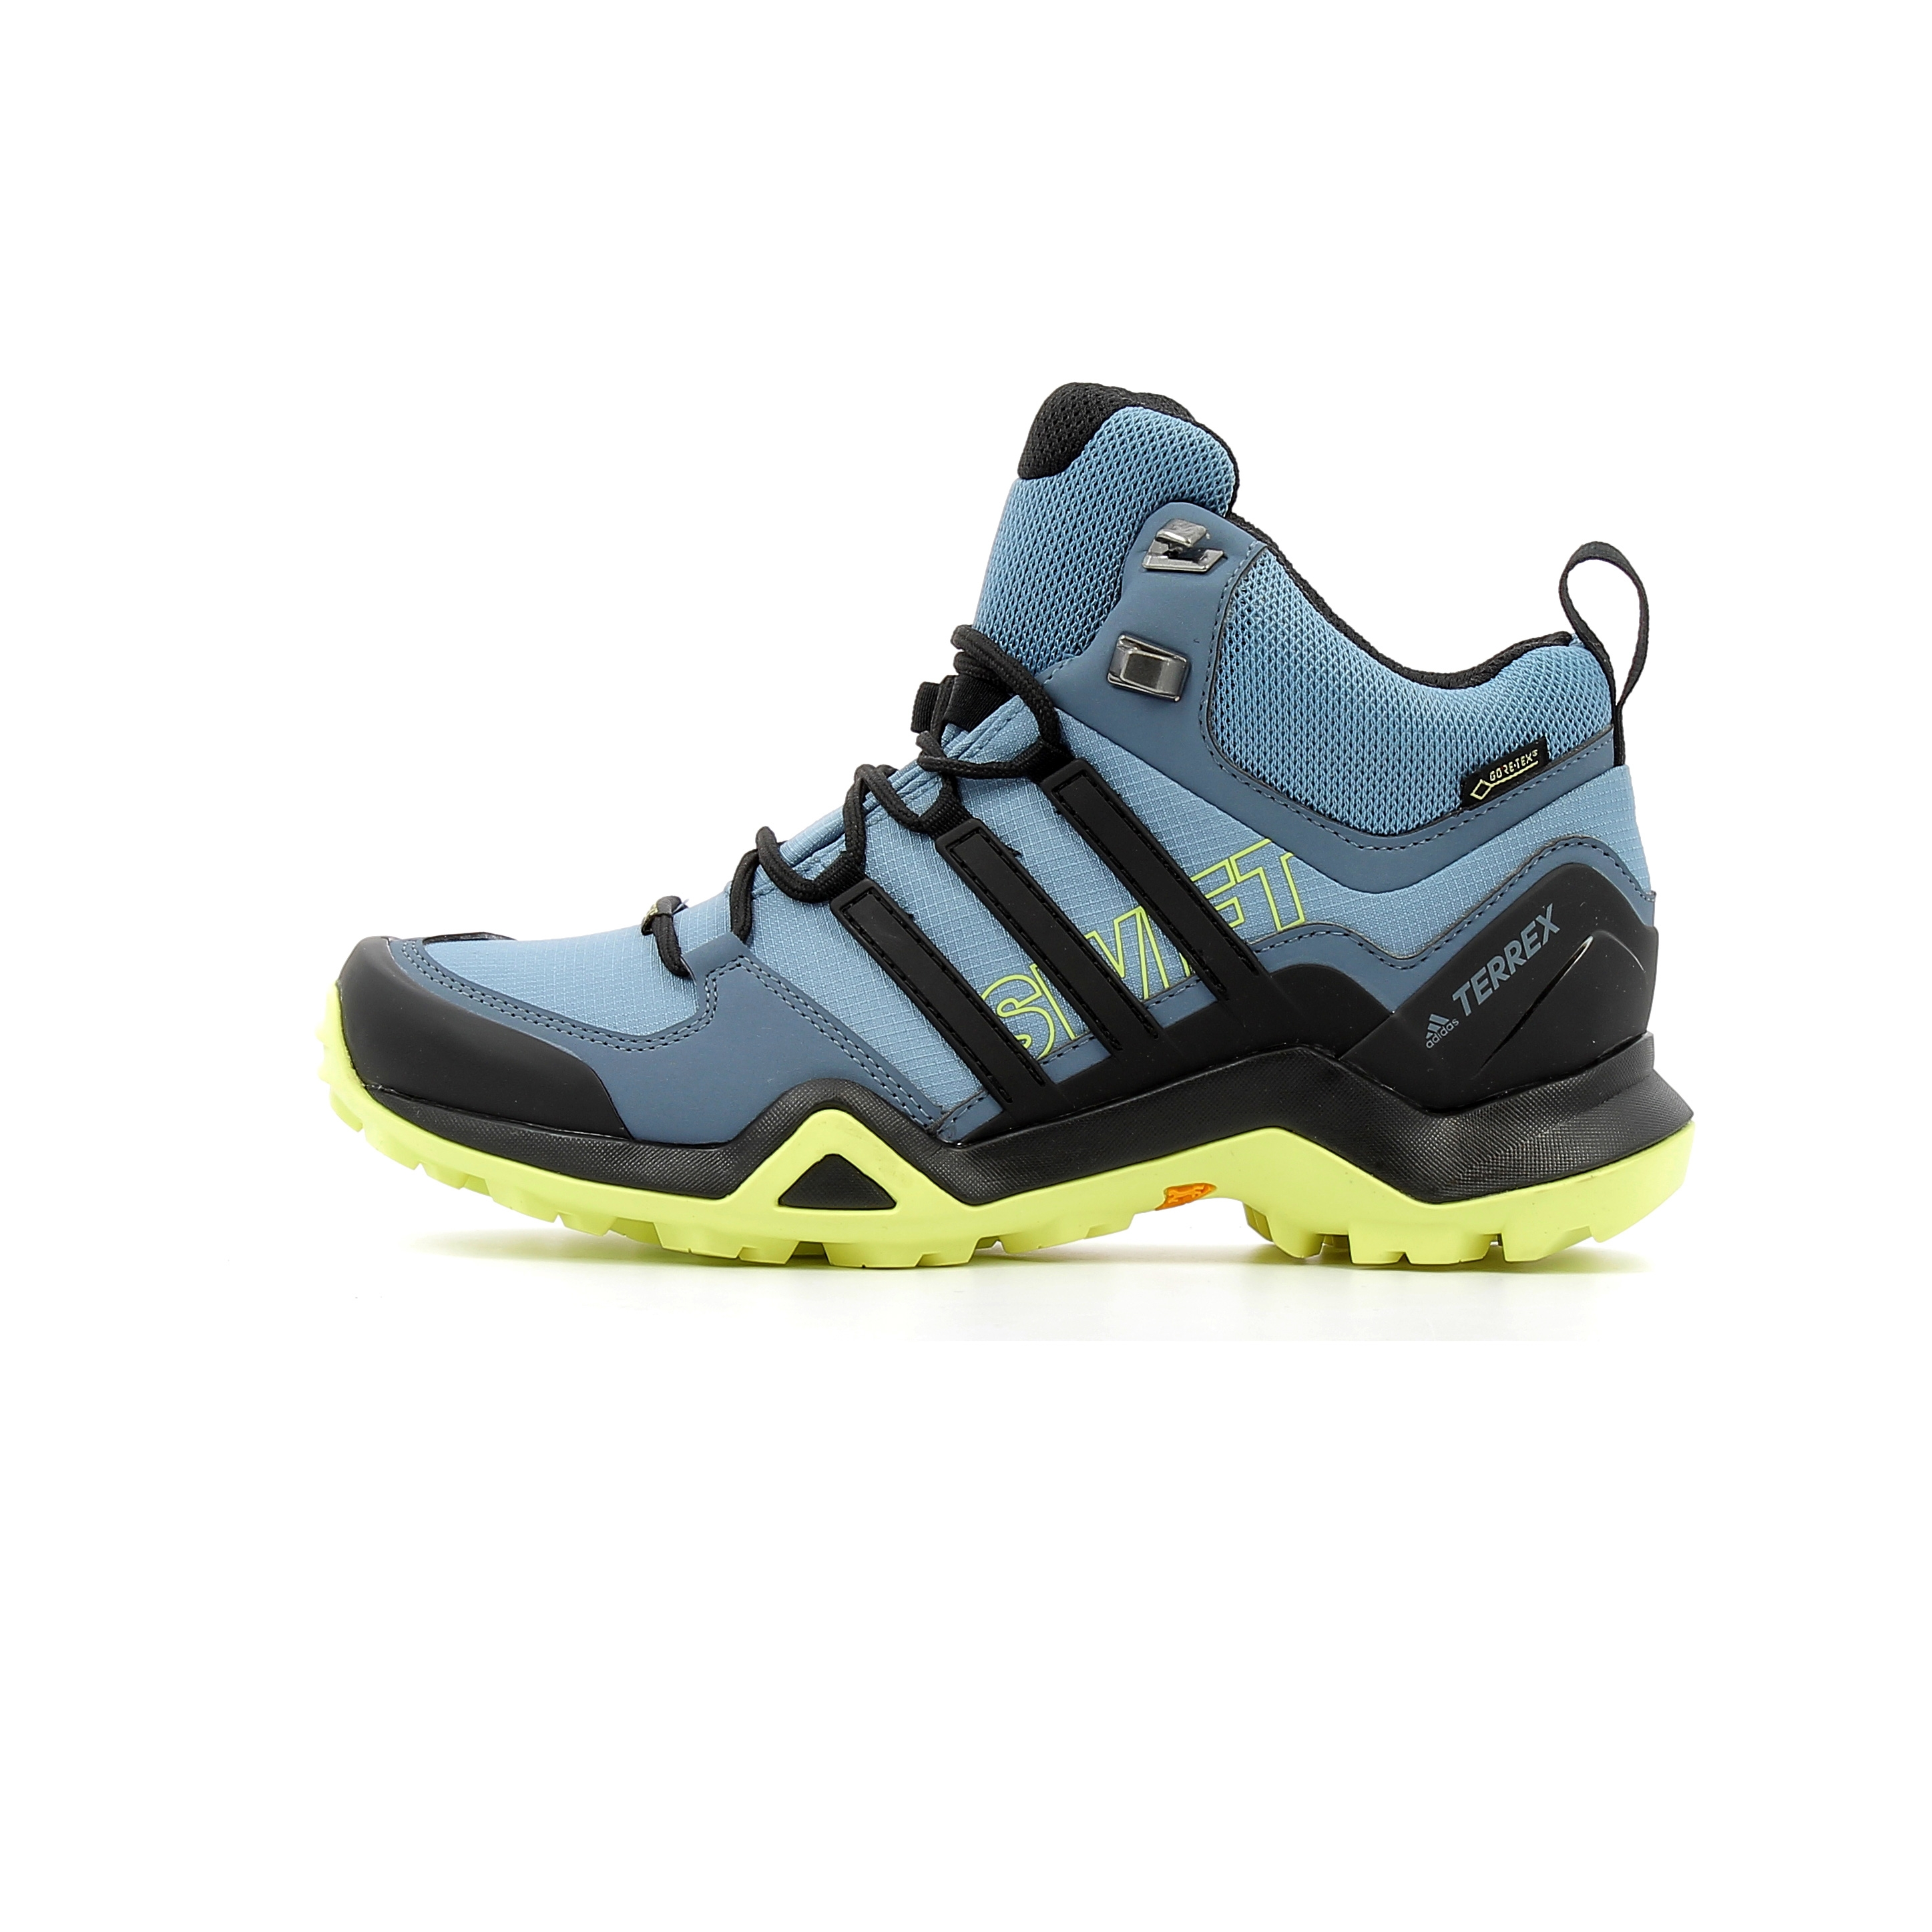 Adidas Mid Performance Swift Gtx Randonnã©e Terrex De R2 Chaussures w0aqnREUxU